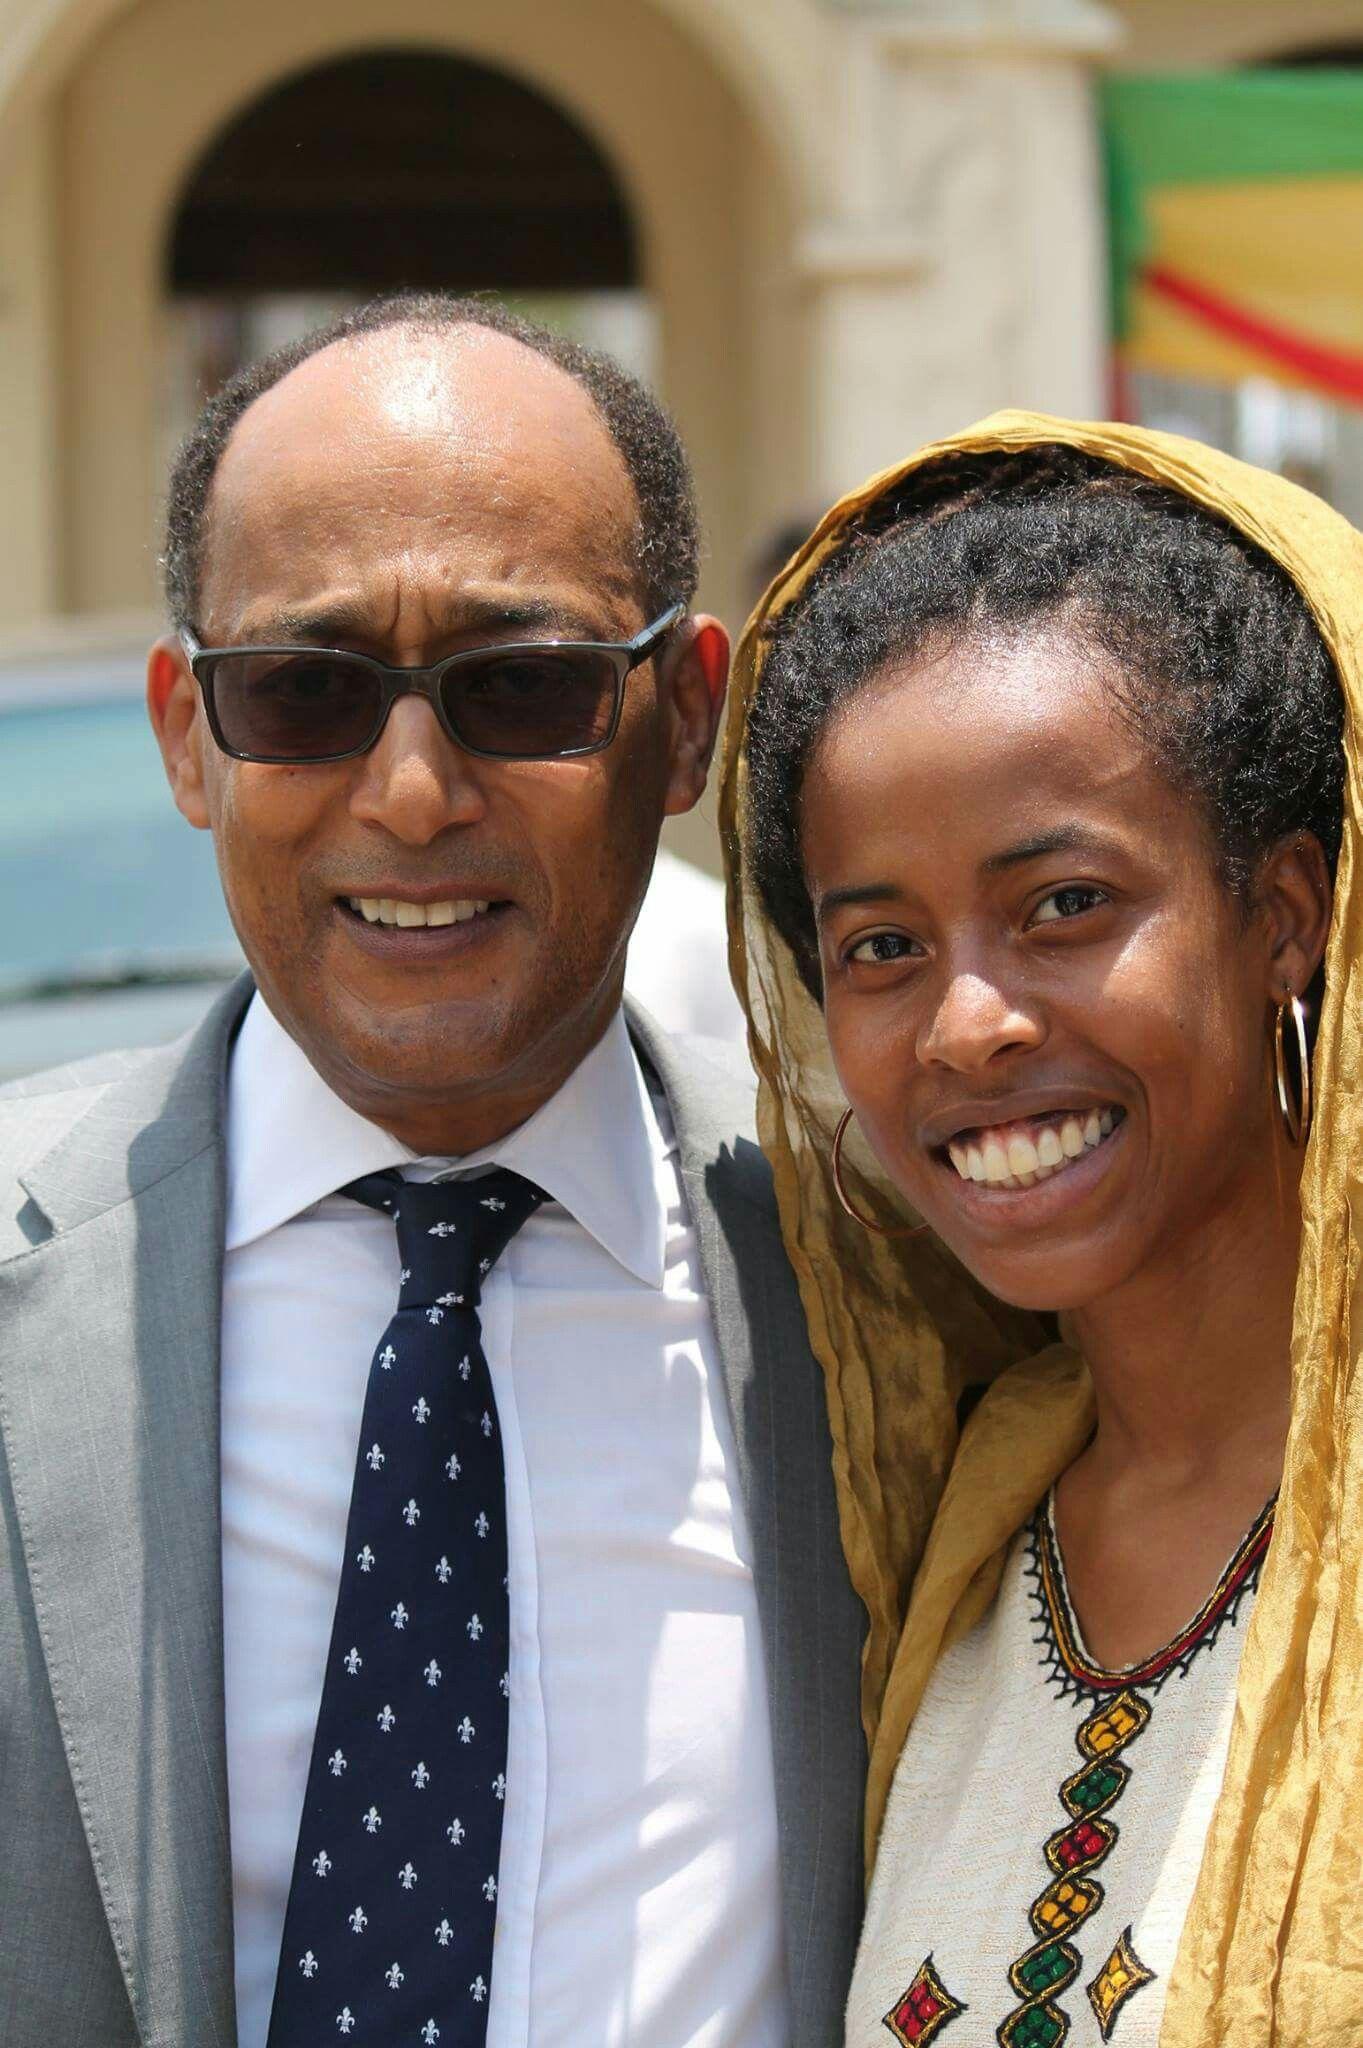 The grandson of Kedamawi Hayl Selasse (Haile Selassie I of Ethiopia) Prince Ermias Sahle Haile Selassie and the granddaughter of Bob Marley Donisha ...